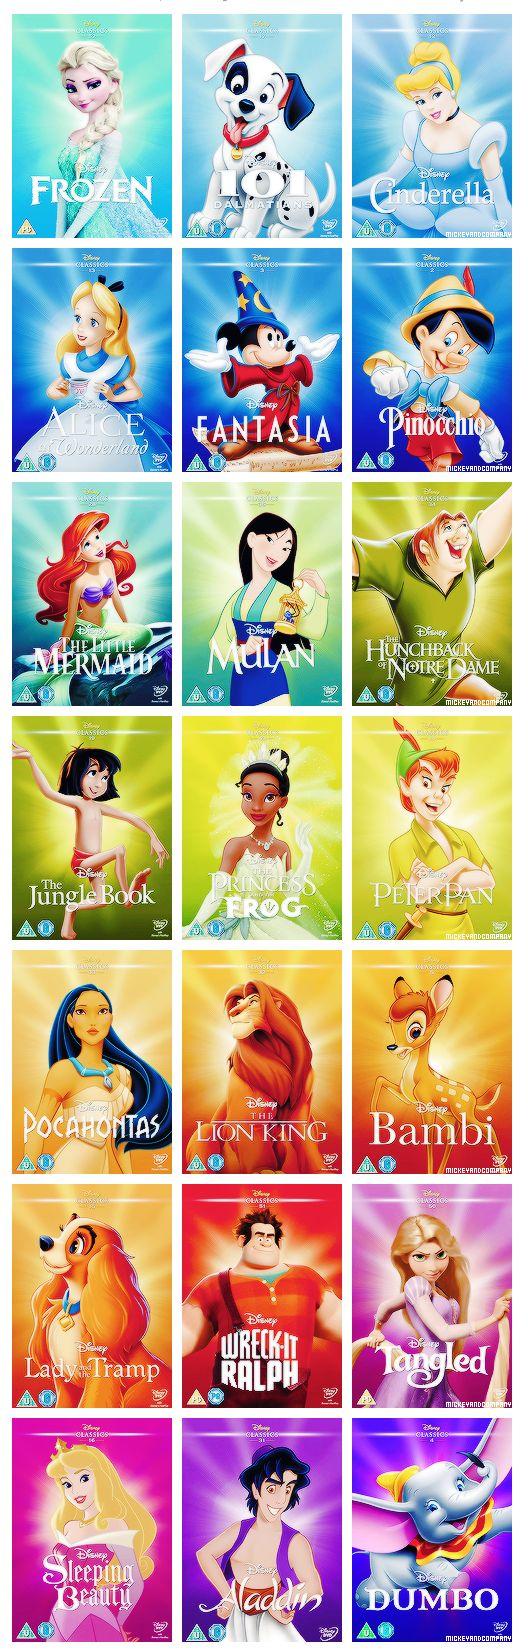 I love Disney!!<3 but omg Aladdin kinda looks creepy